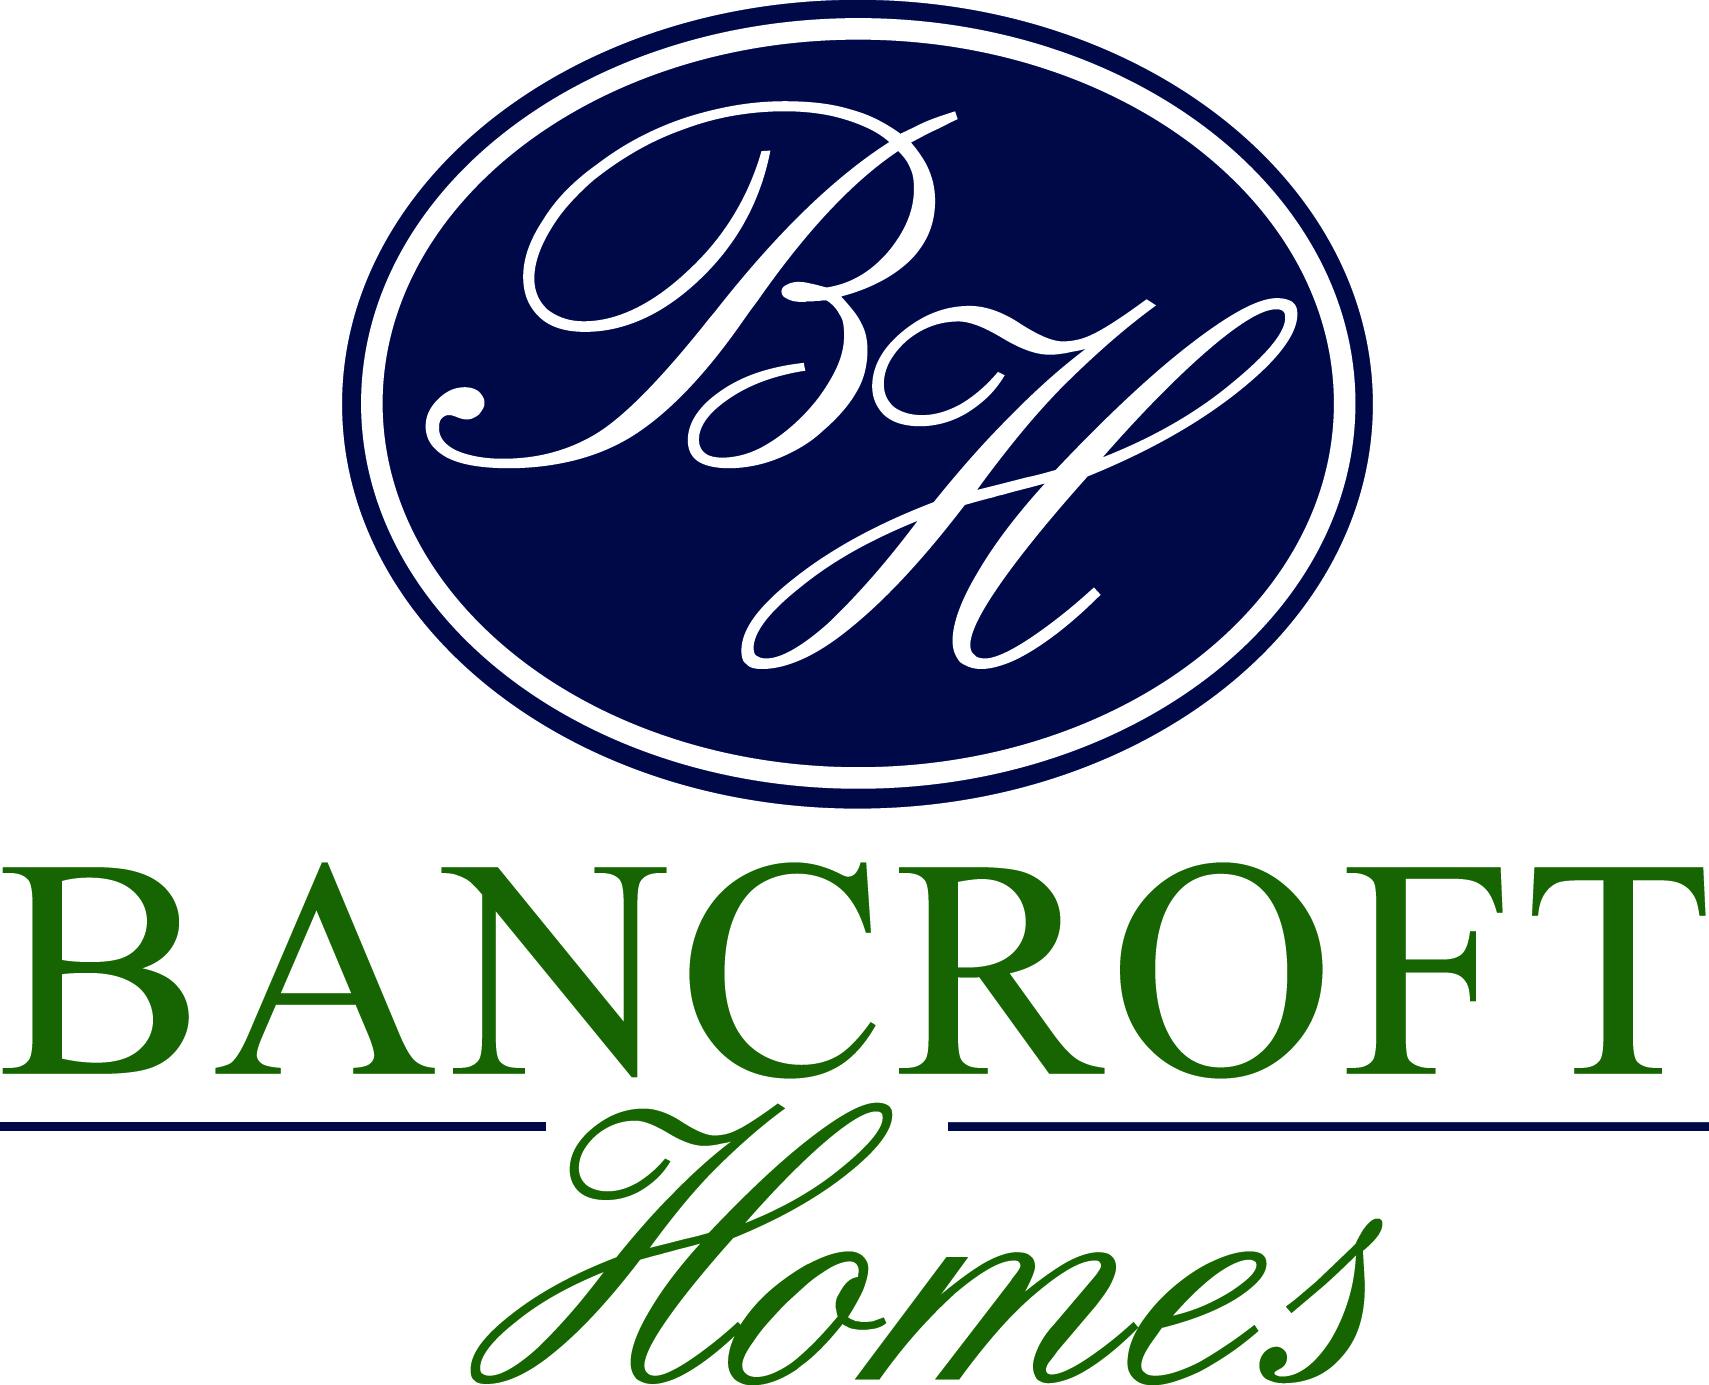 Bancroft Homes Logo - 2012.jpg